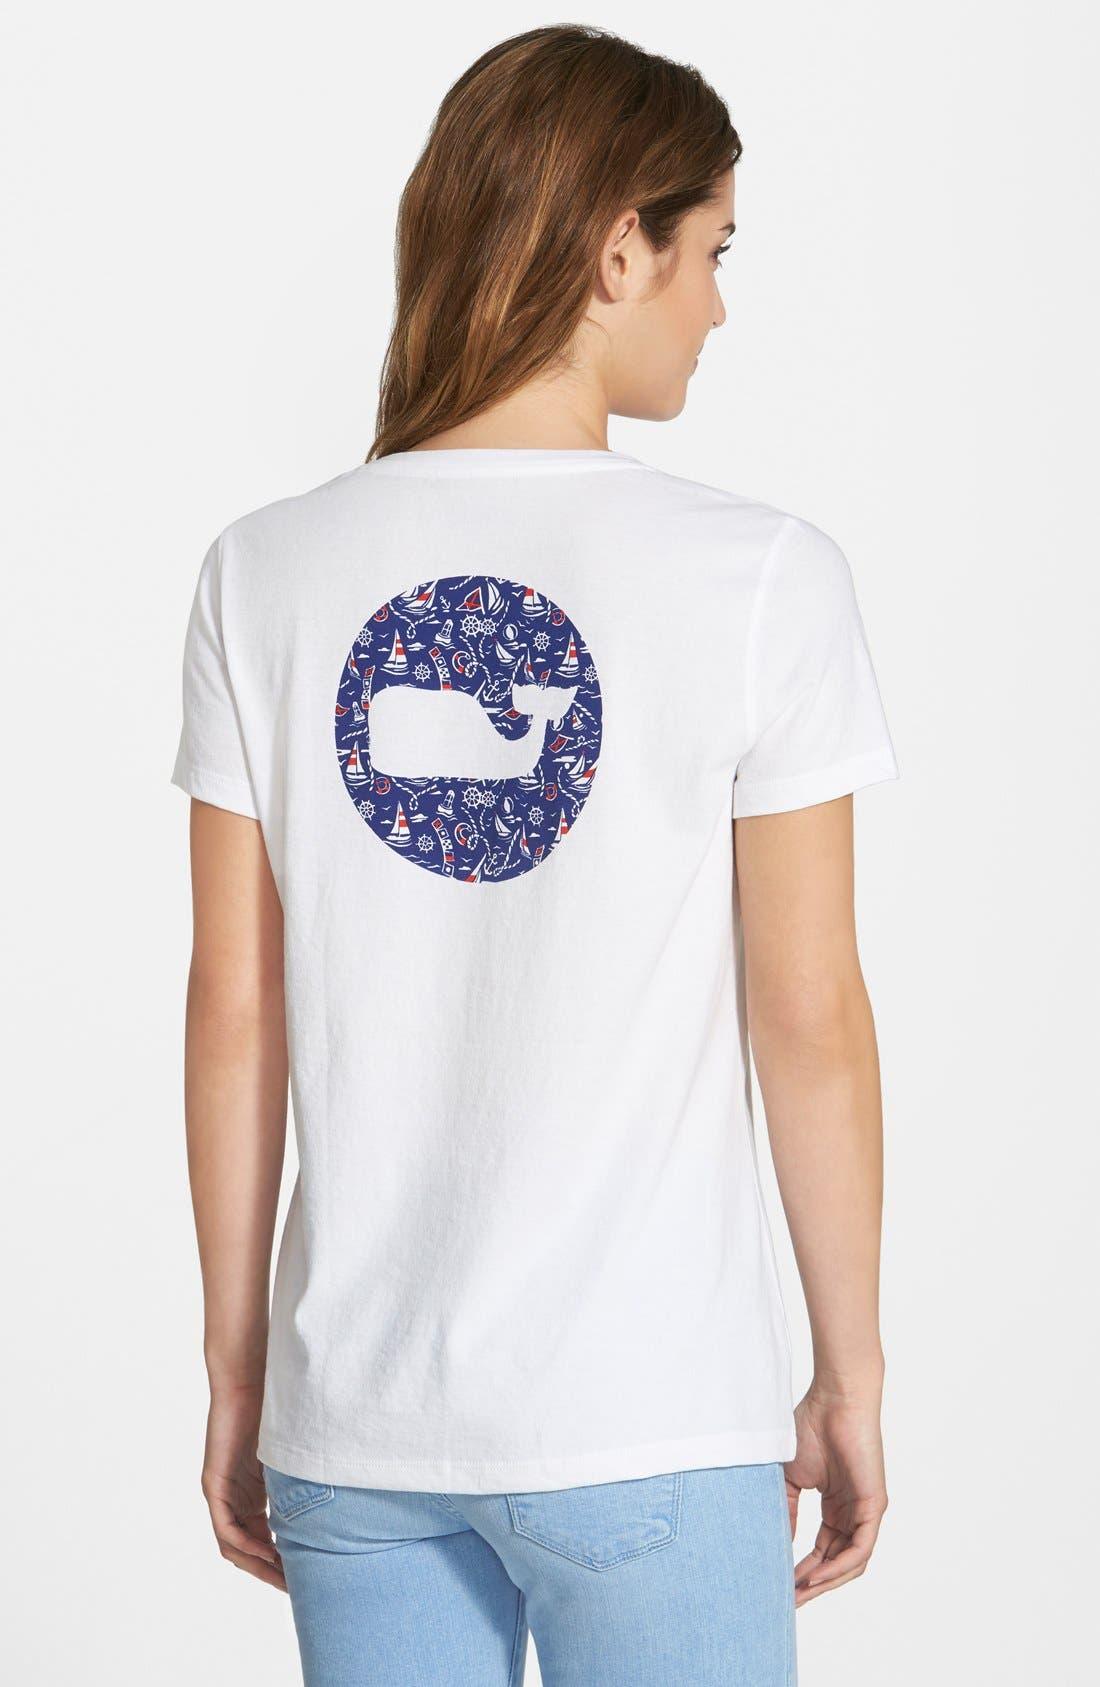 Alternate Image 2  - Vineyard Vines 'Nautical Whale Dot' Crewneck Tee